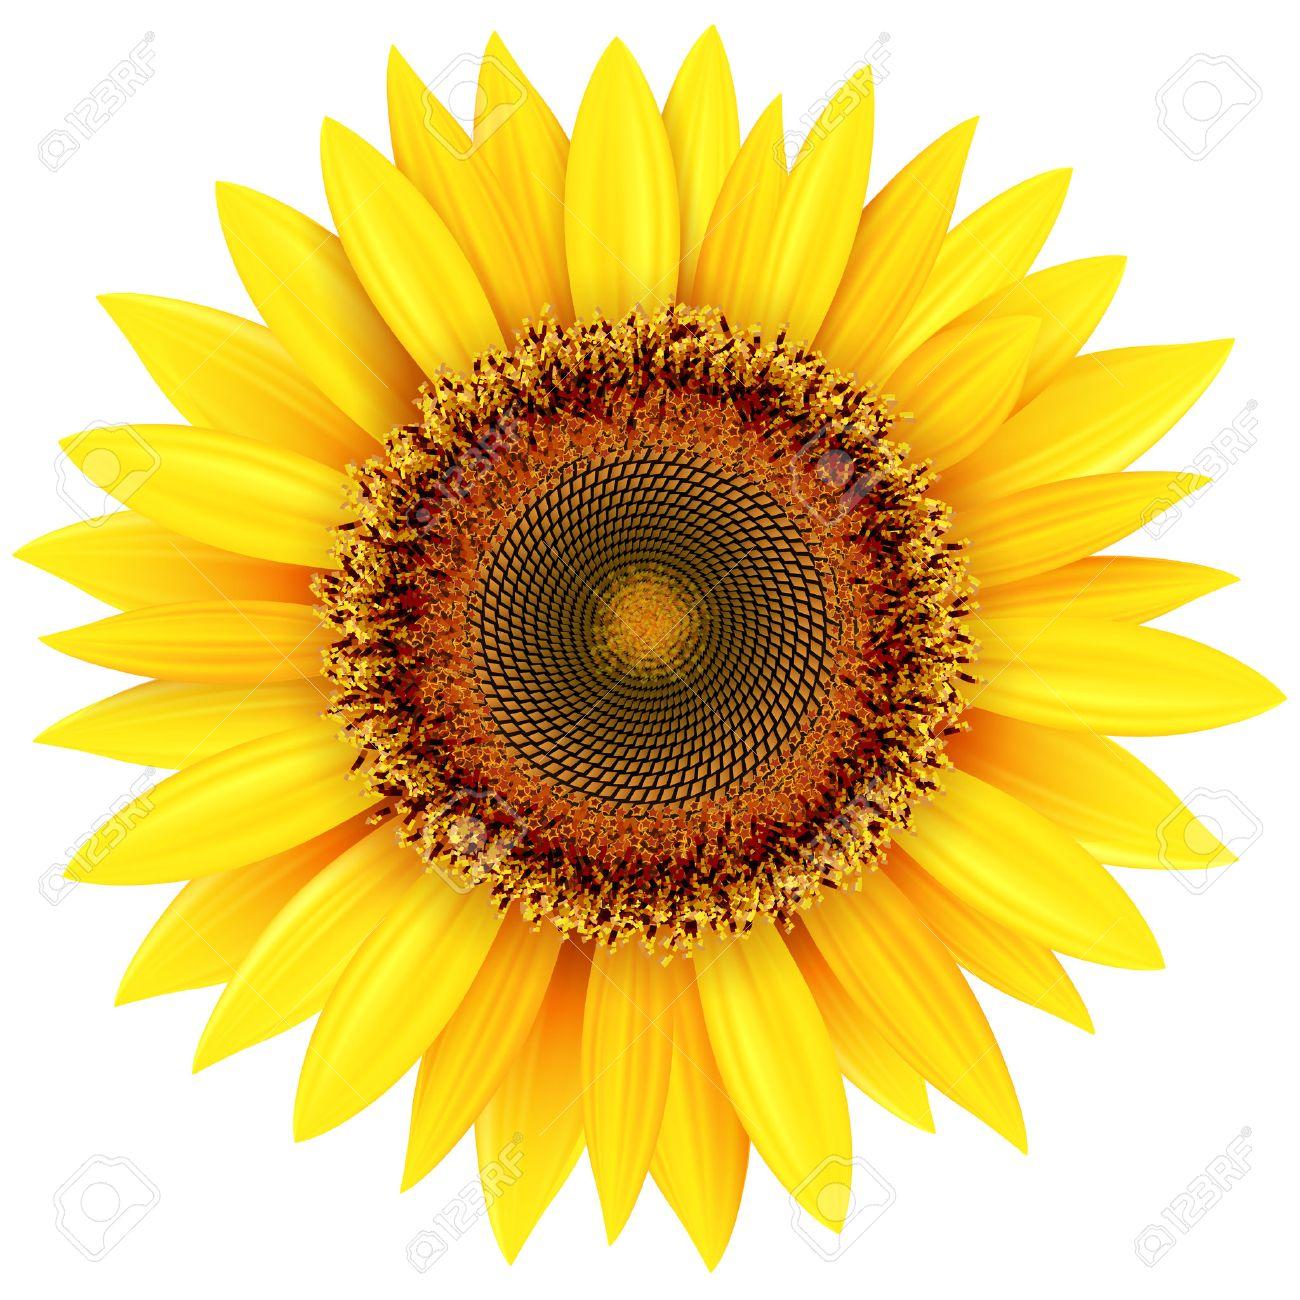 Sunflower isolated, vector illustration. - 44844911